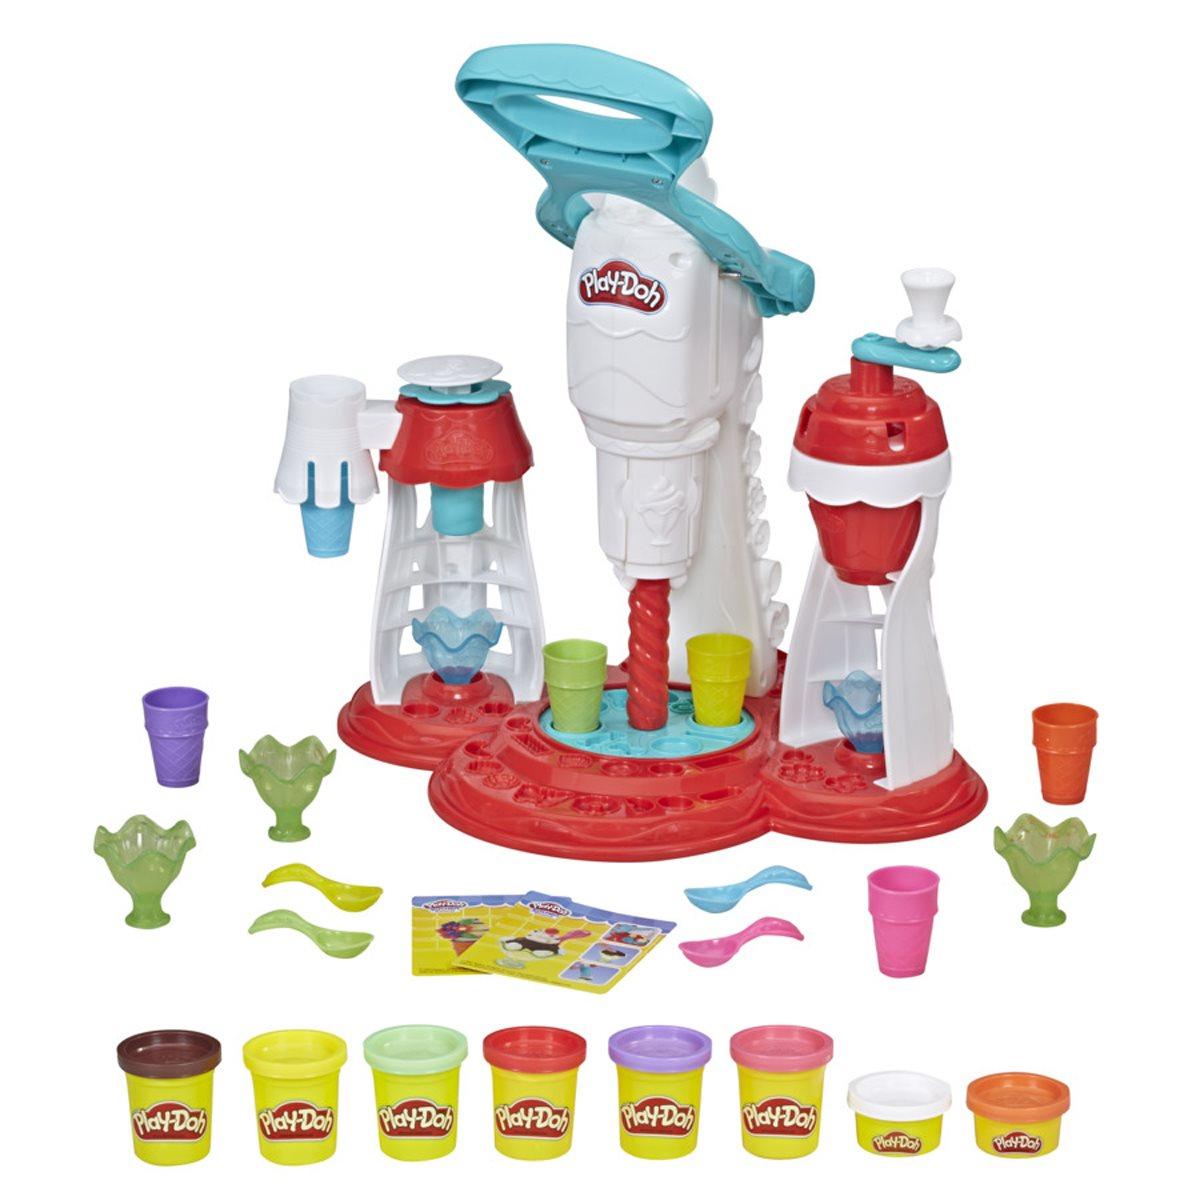 Play Doh Kitchen Creations Ultimate Swirl Ice Cream Maker